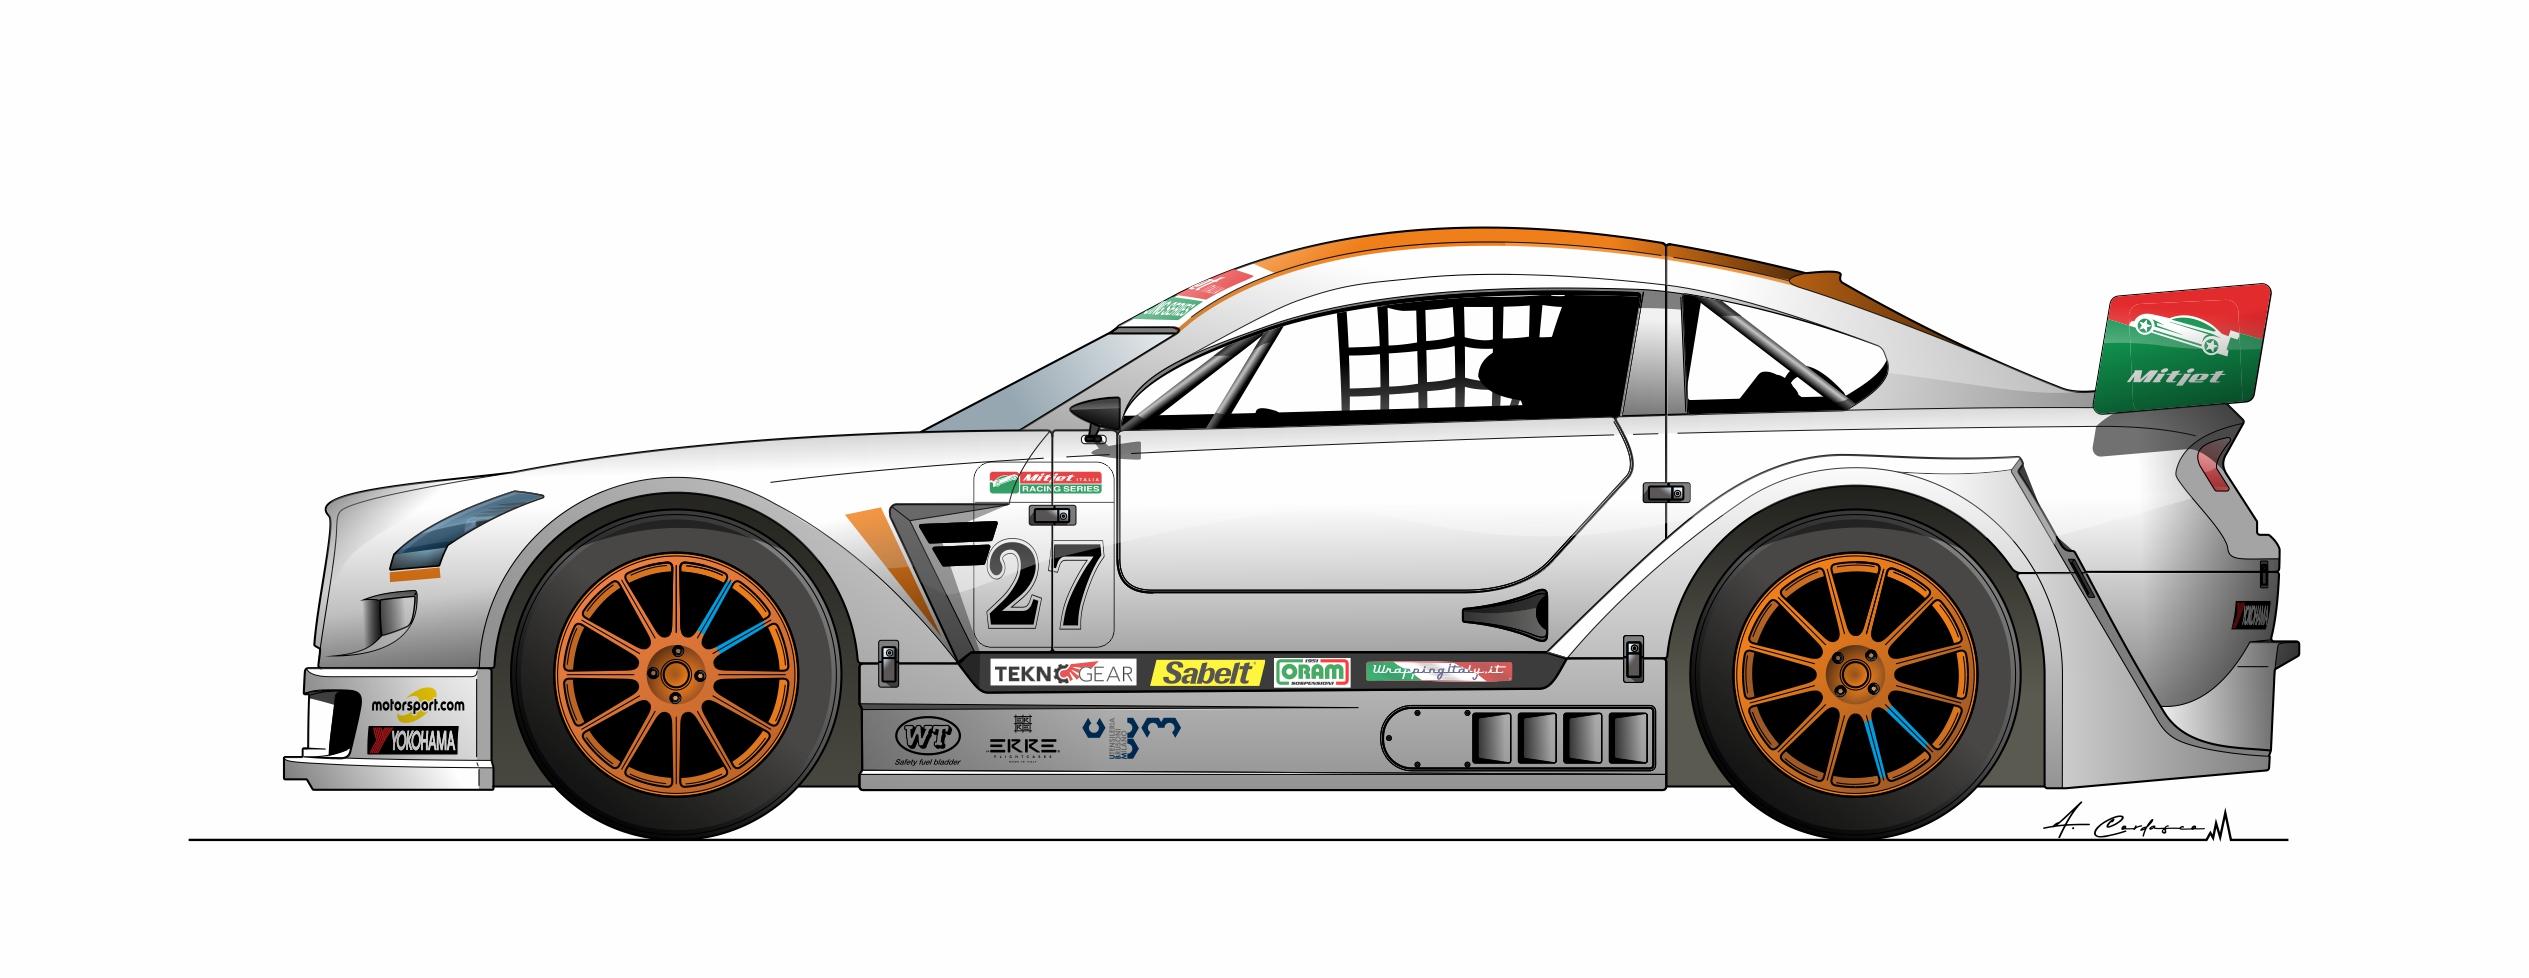 Enrico Garbelli - Team Nova Race